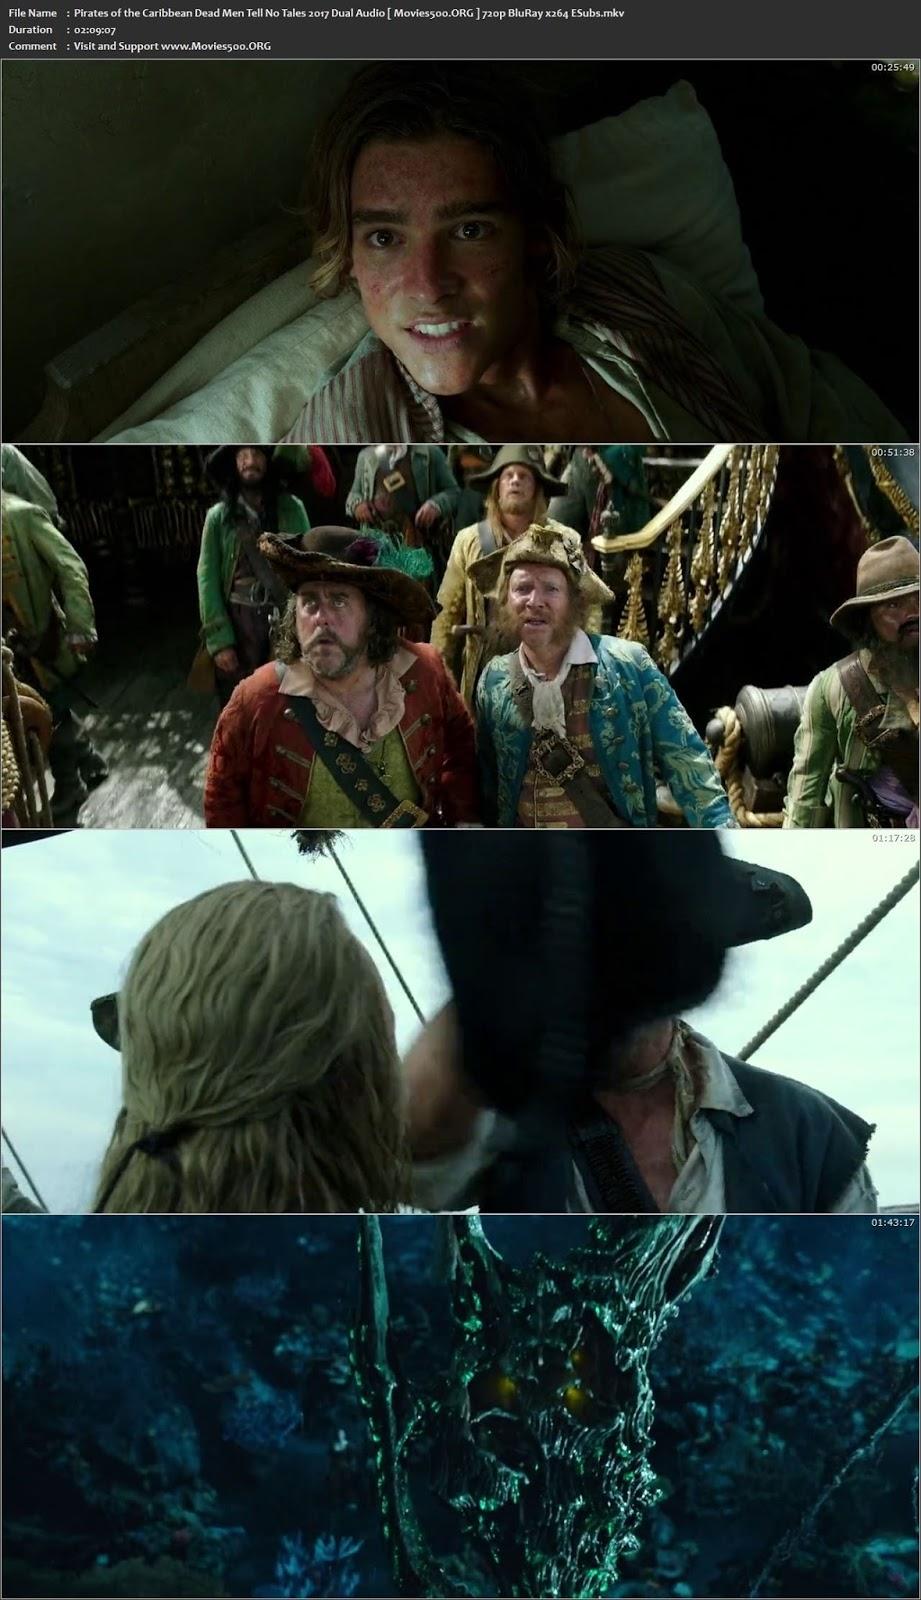 Pirates of the Caribbean Dead Men Tell No Tales 2017 Dual Audio Hindi 720p BluRay ESubs at movies500.org